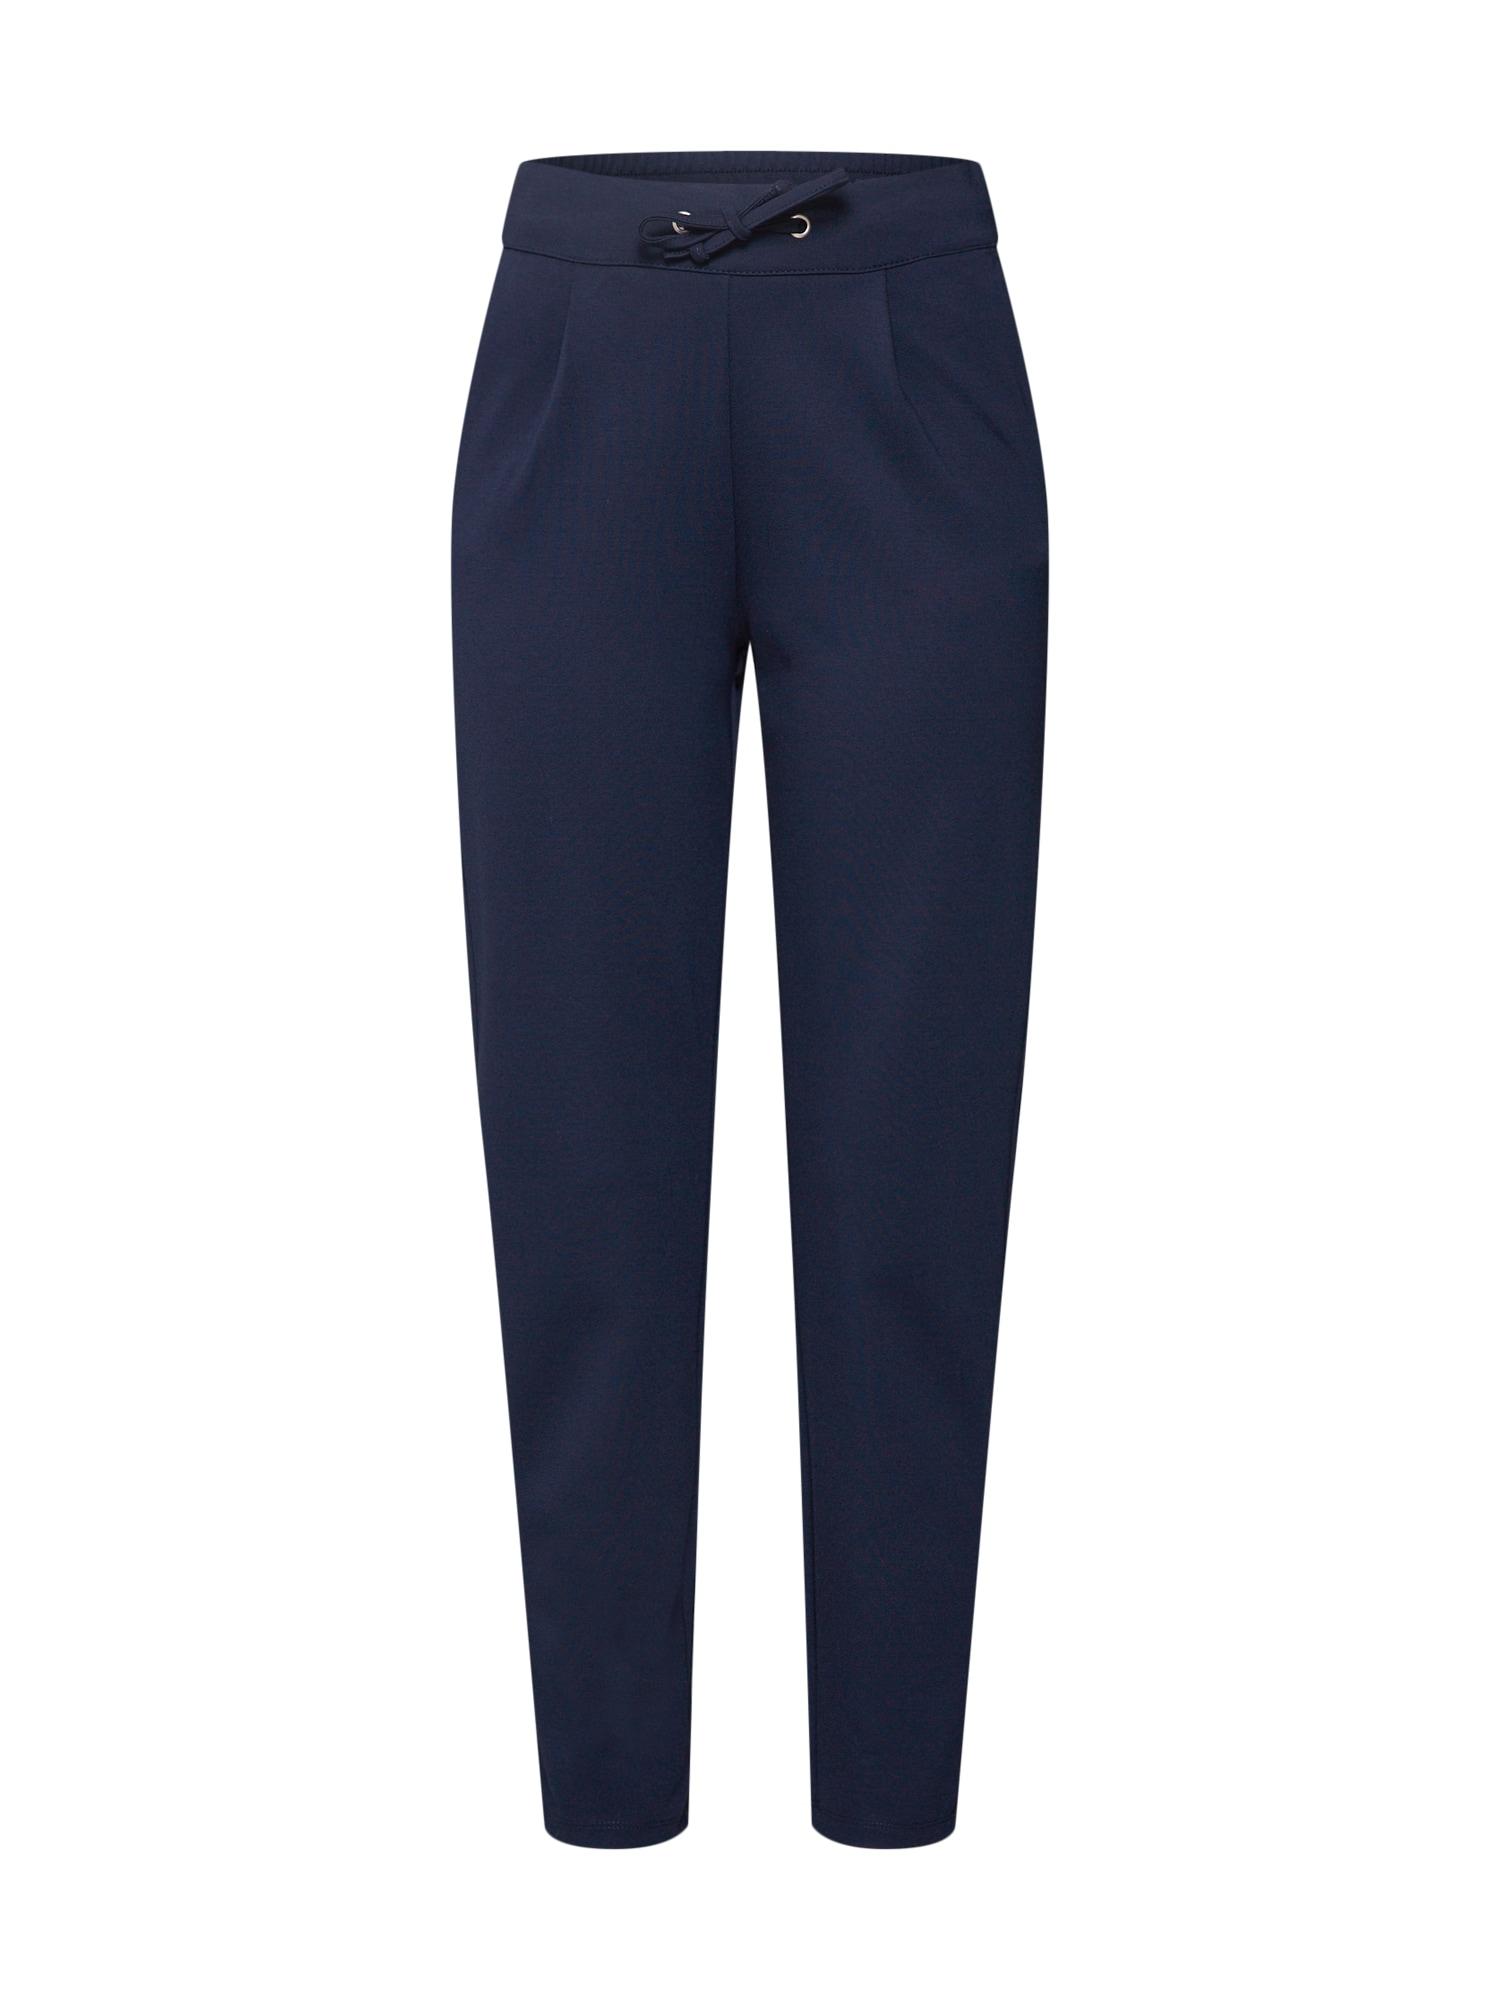 JACQUELINE de YONG Klostuotos kelnės 'Pretty' tamsiai mėlyna